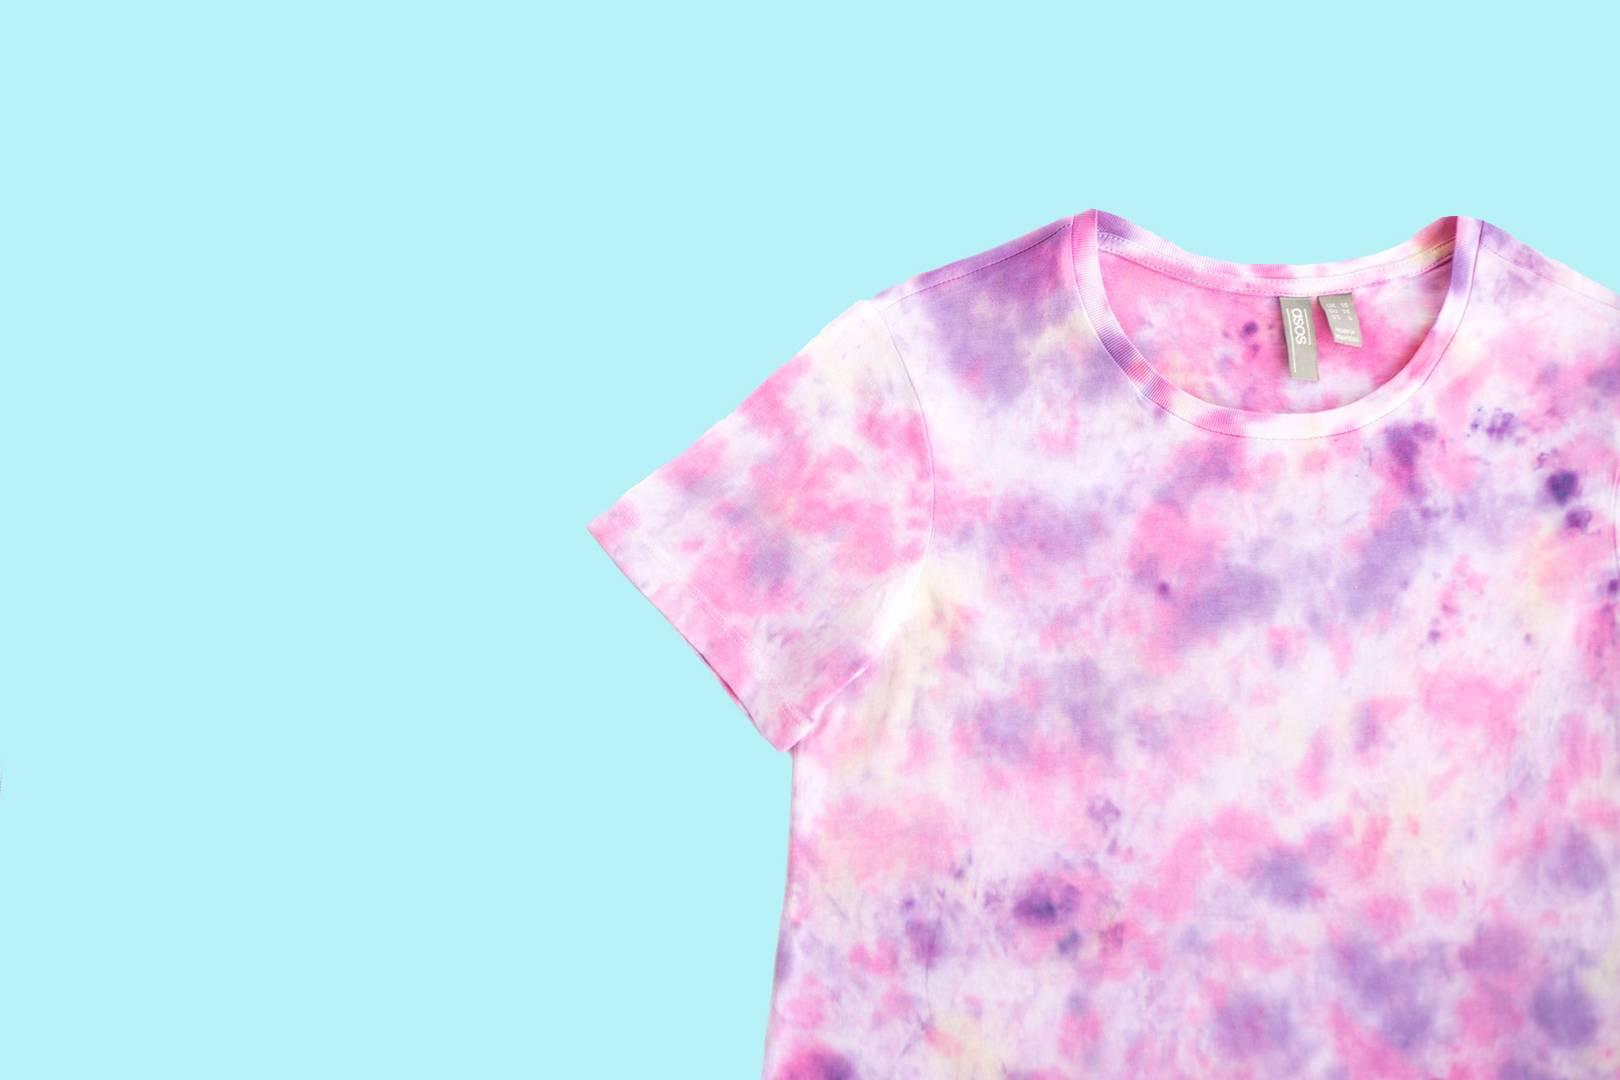 3ef75a060 DIY A Tie-Dye T-Shirt - Tutorial For Spring/Summer 2019 Biggest Catwalk  Trend   British Vogue